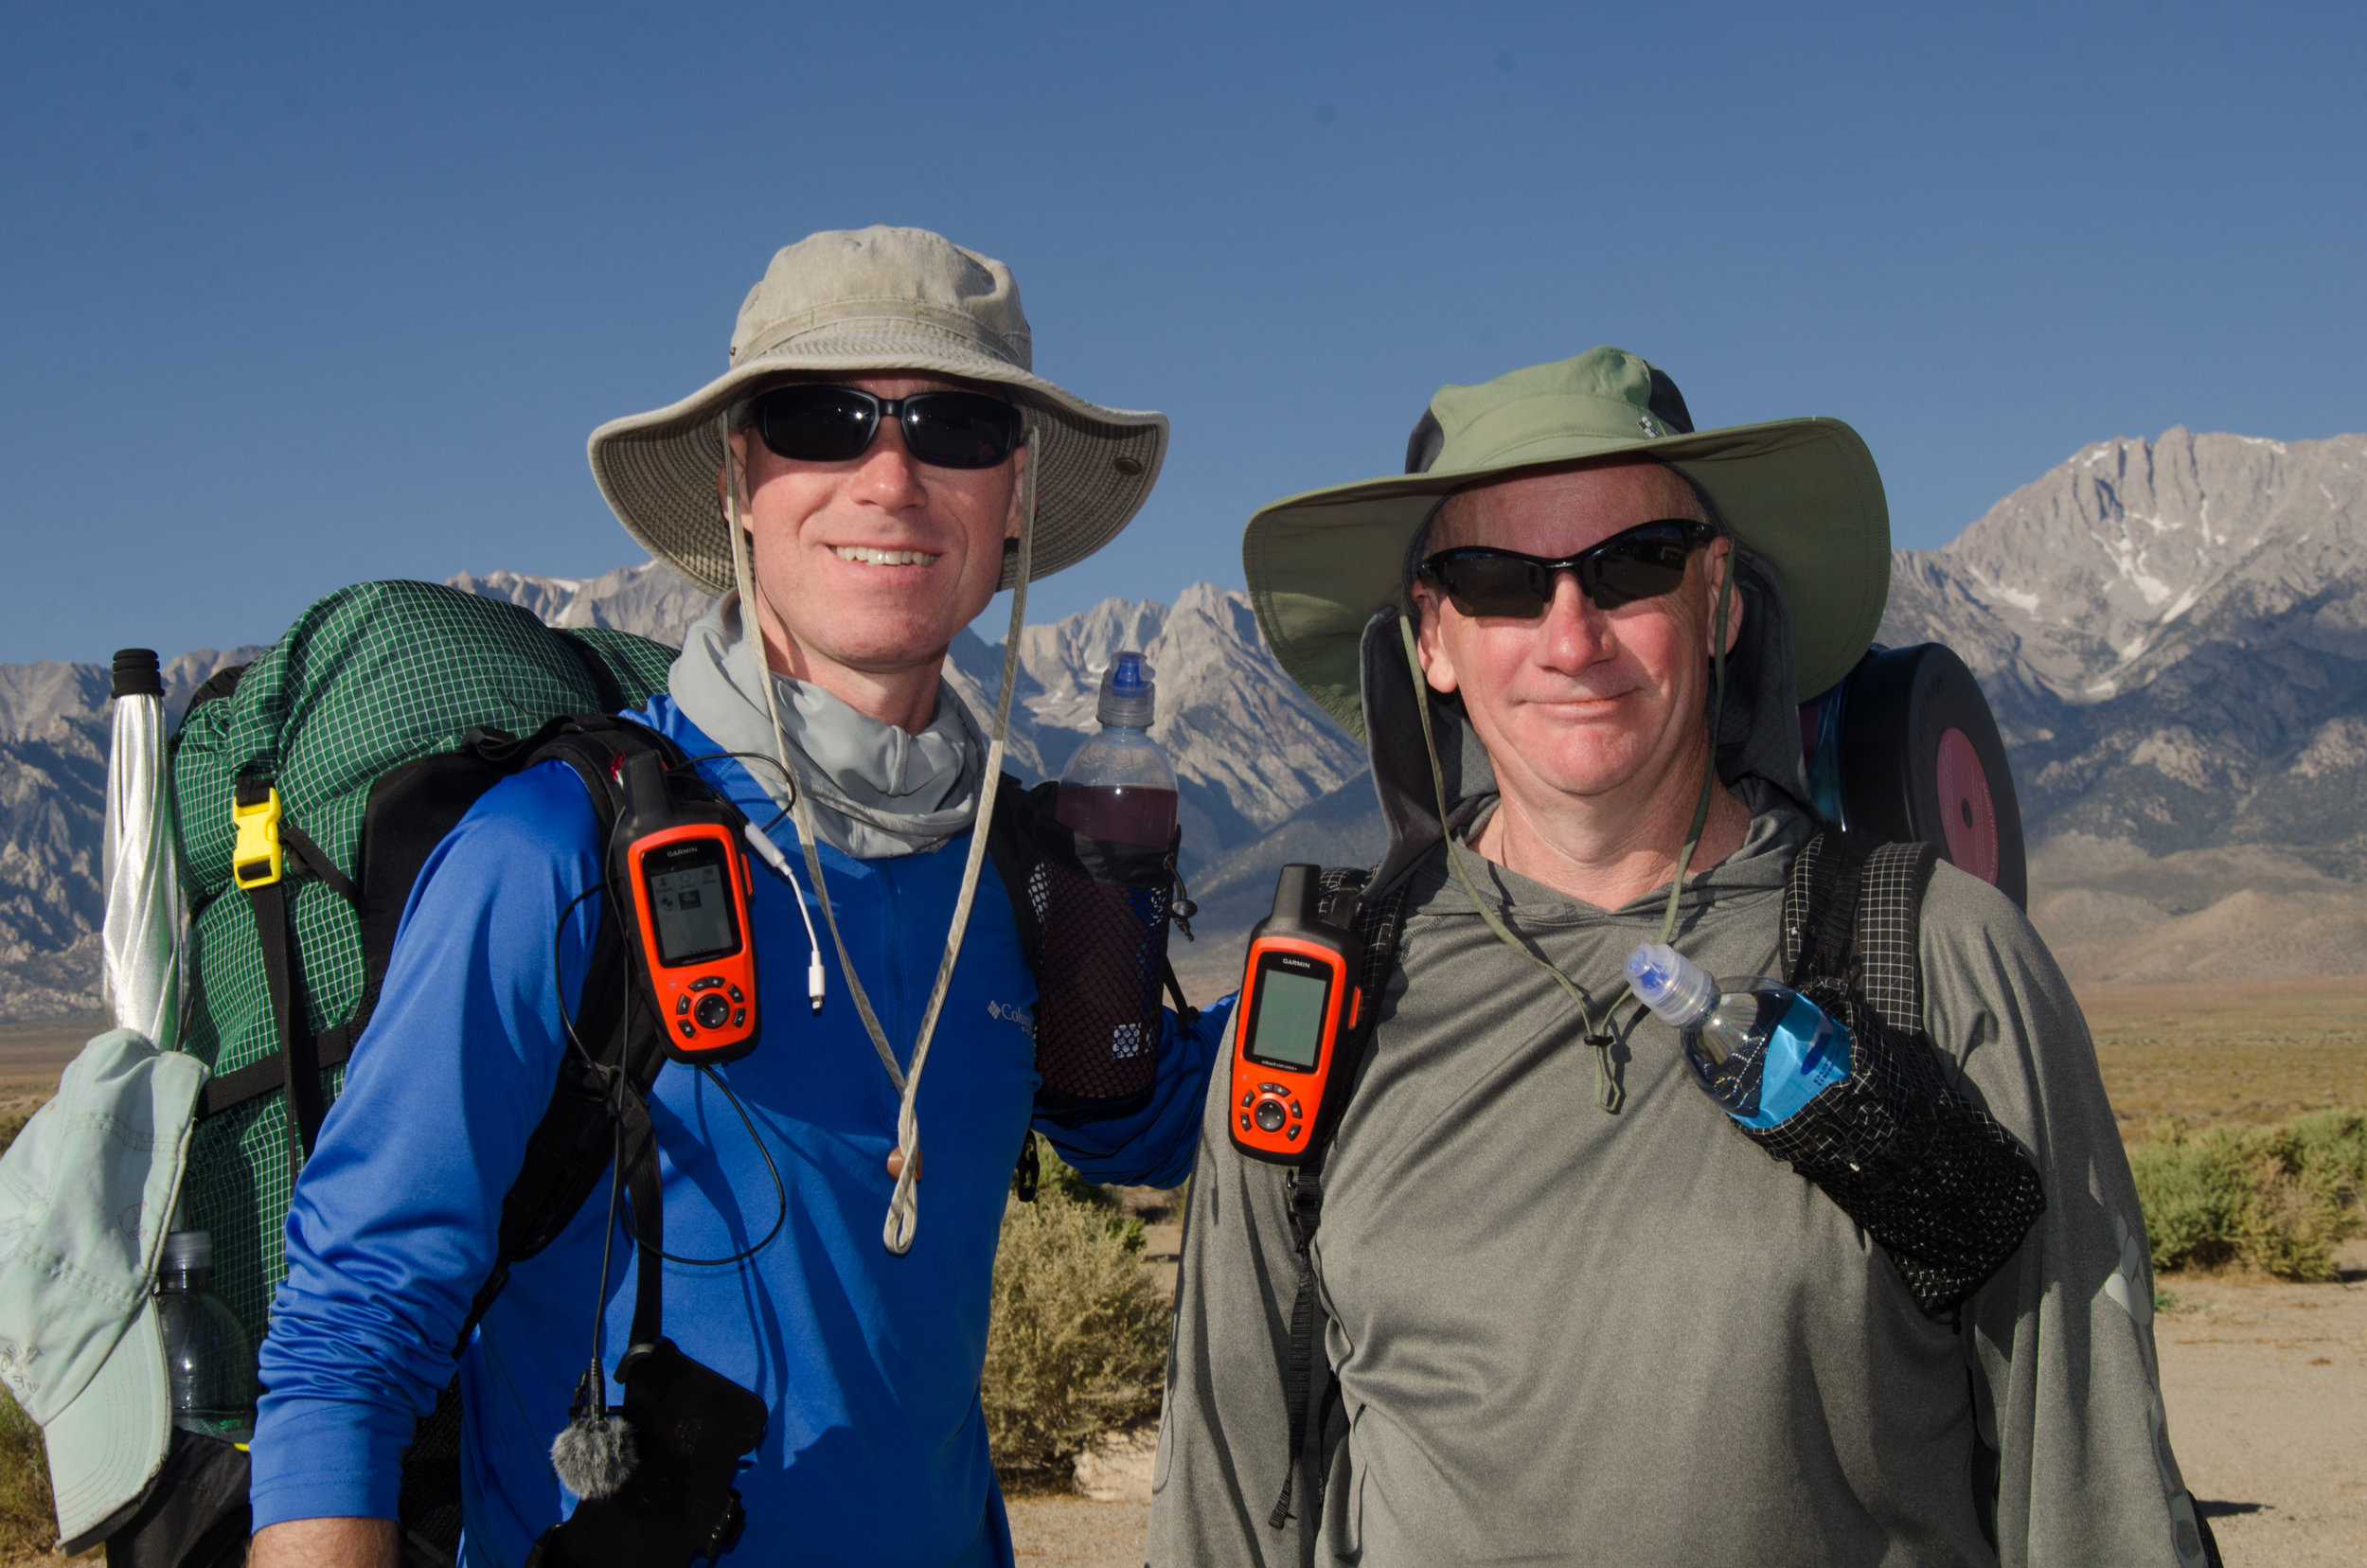 JMT Hikers Rance and Sean